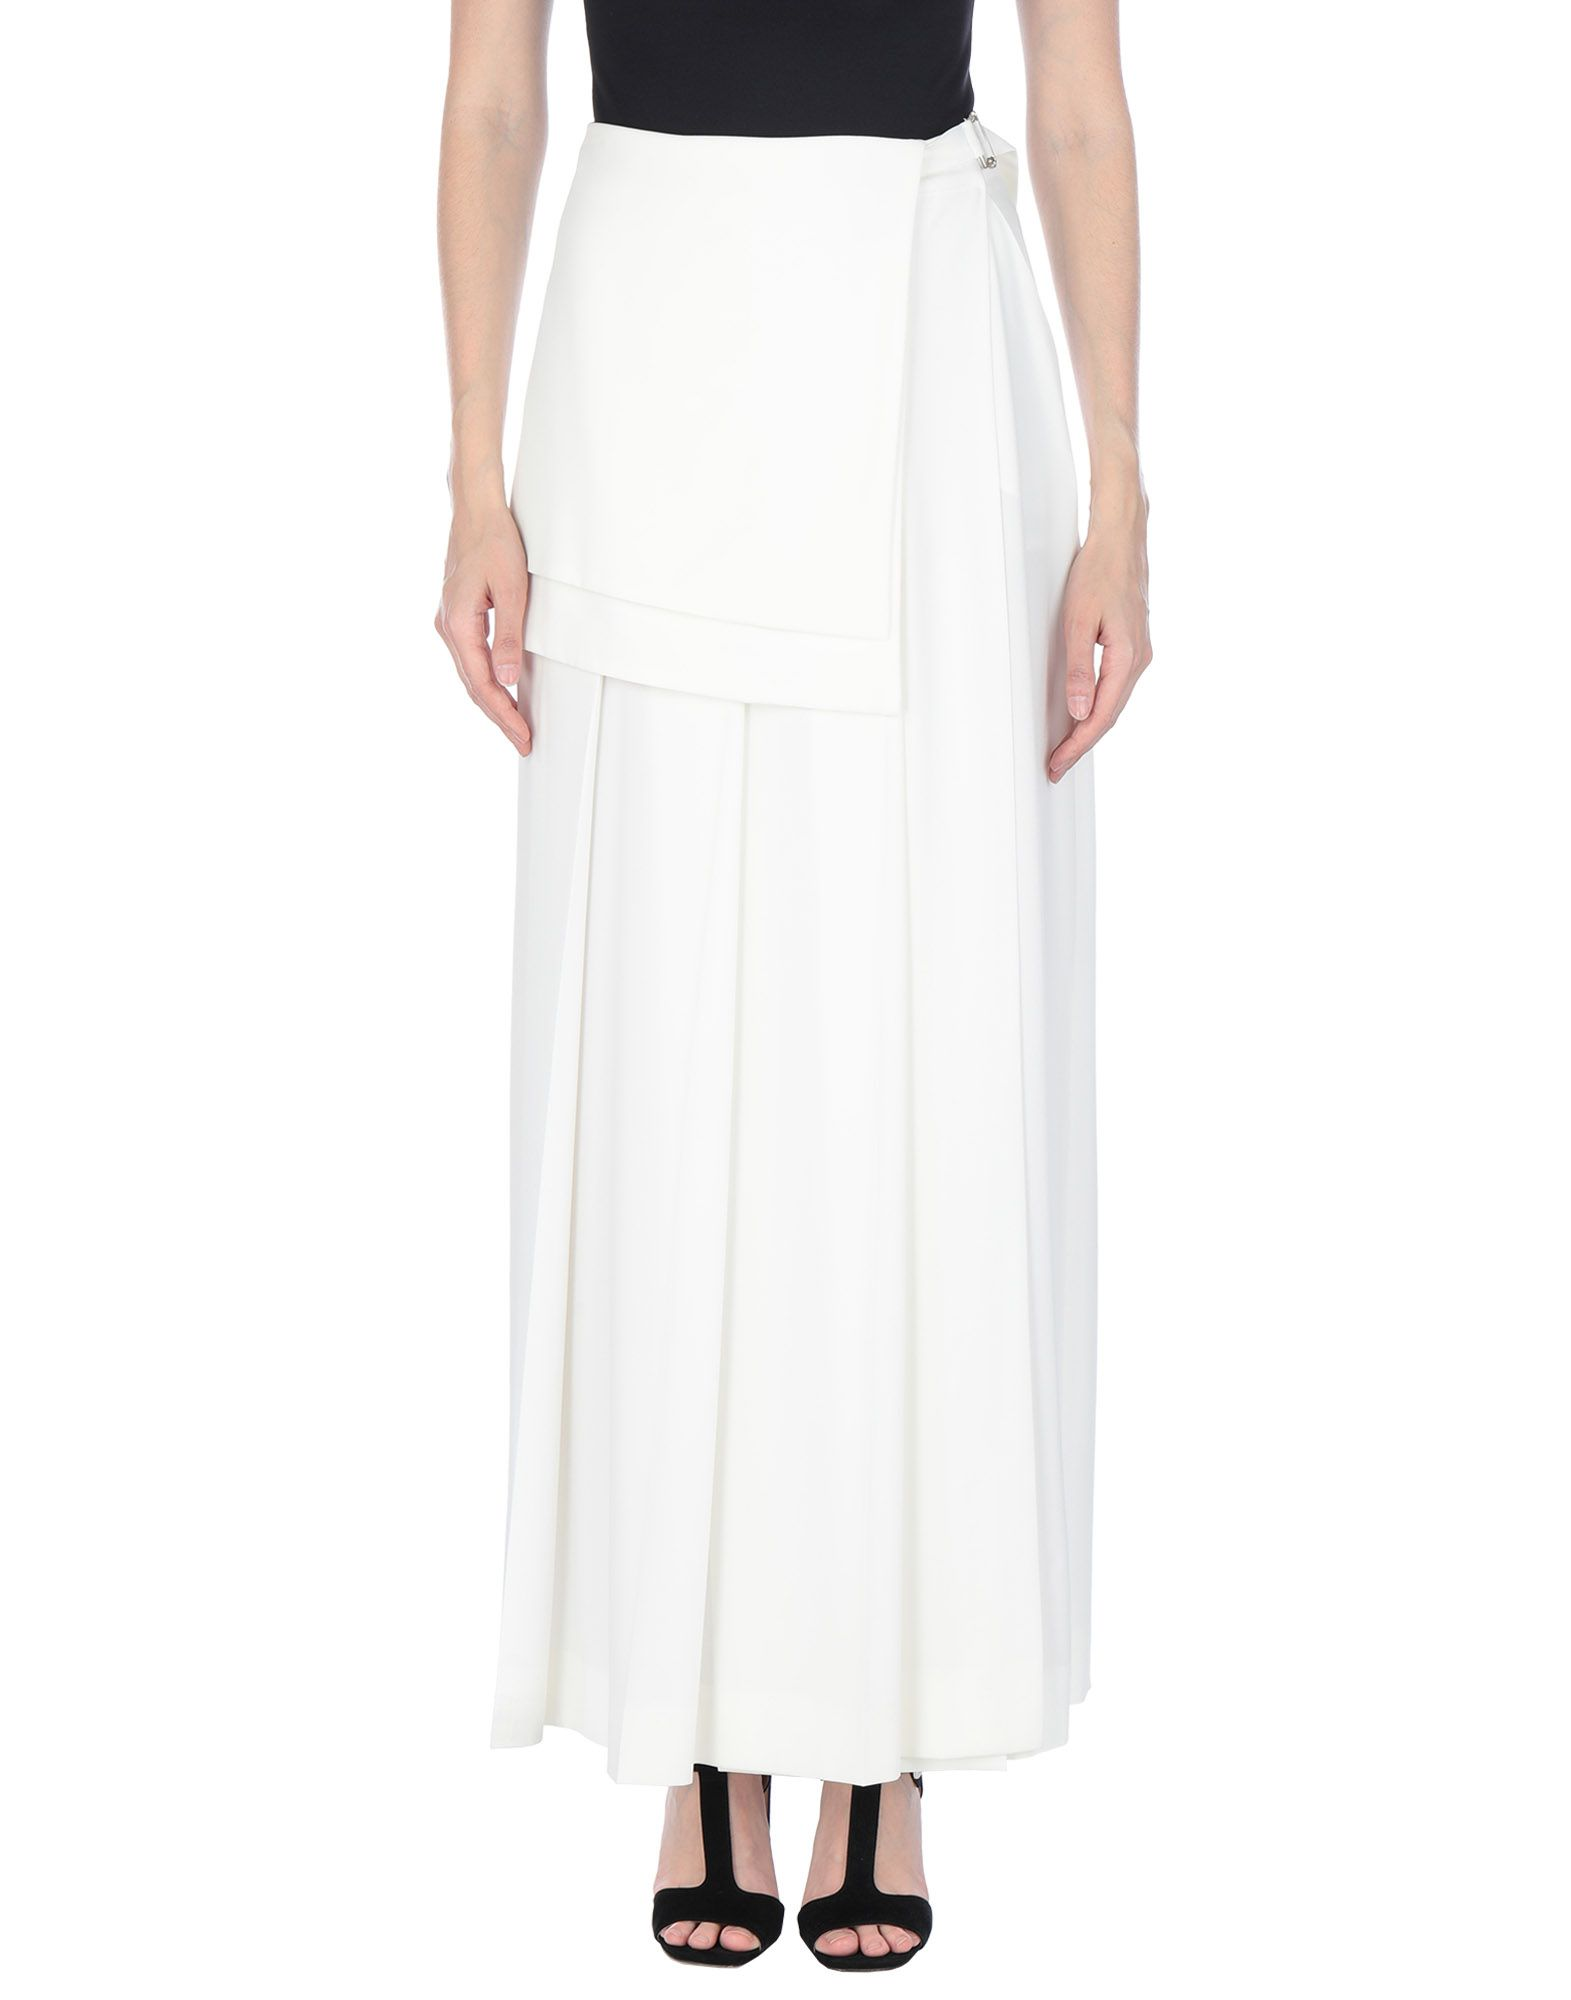 OFF-WHITE™ Длинная юбка off white™ мини юбка